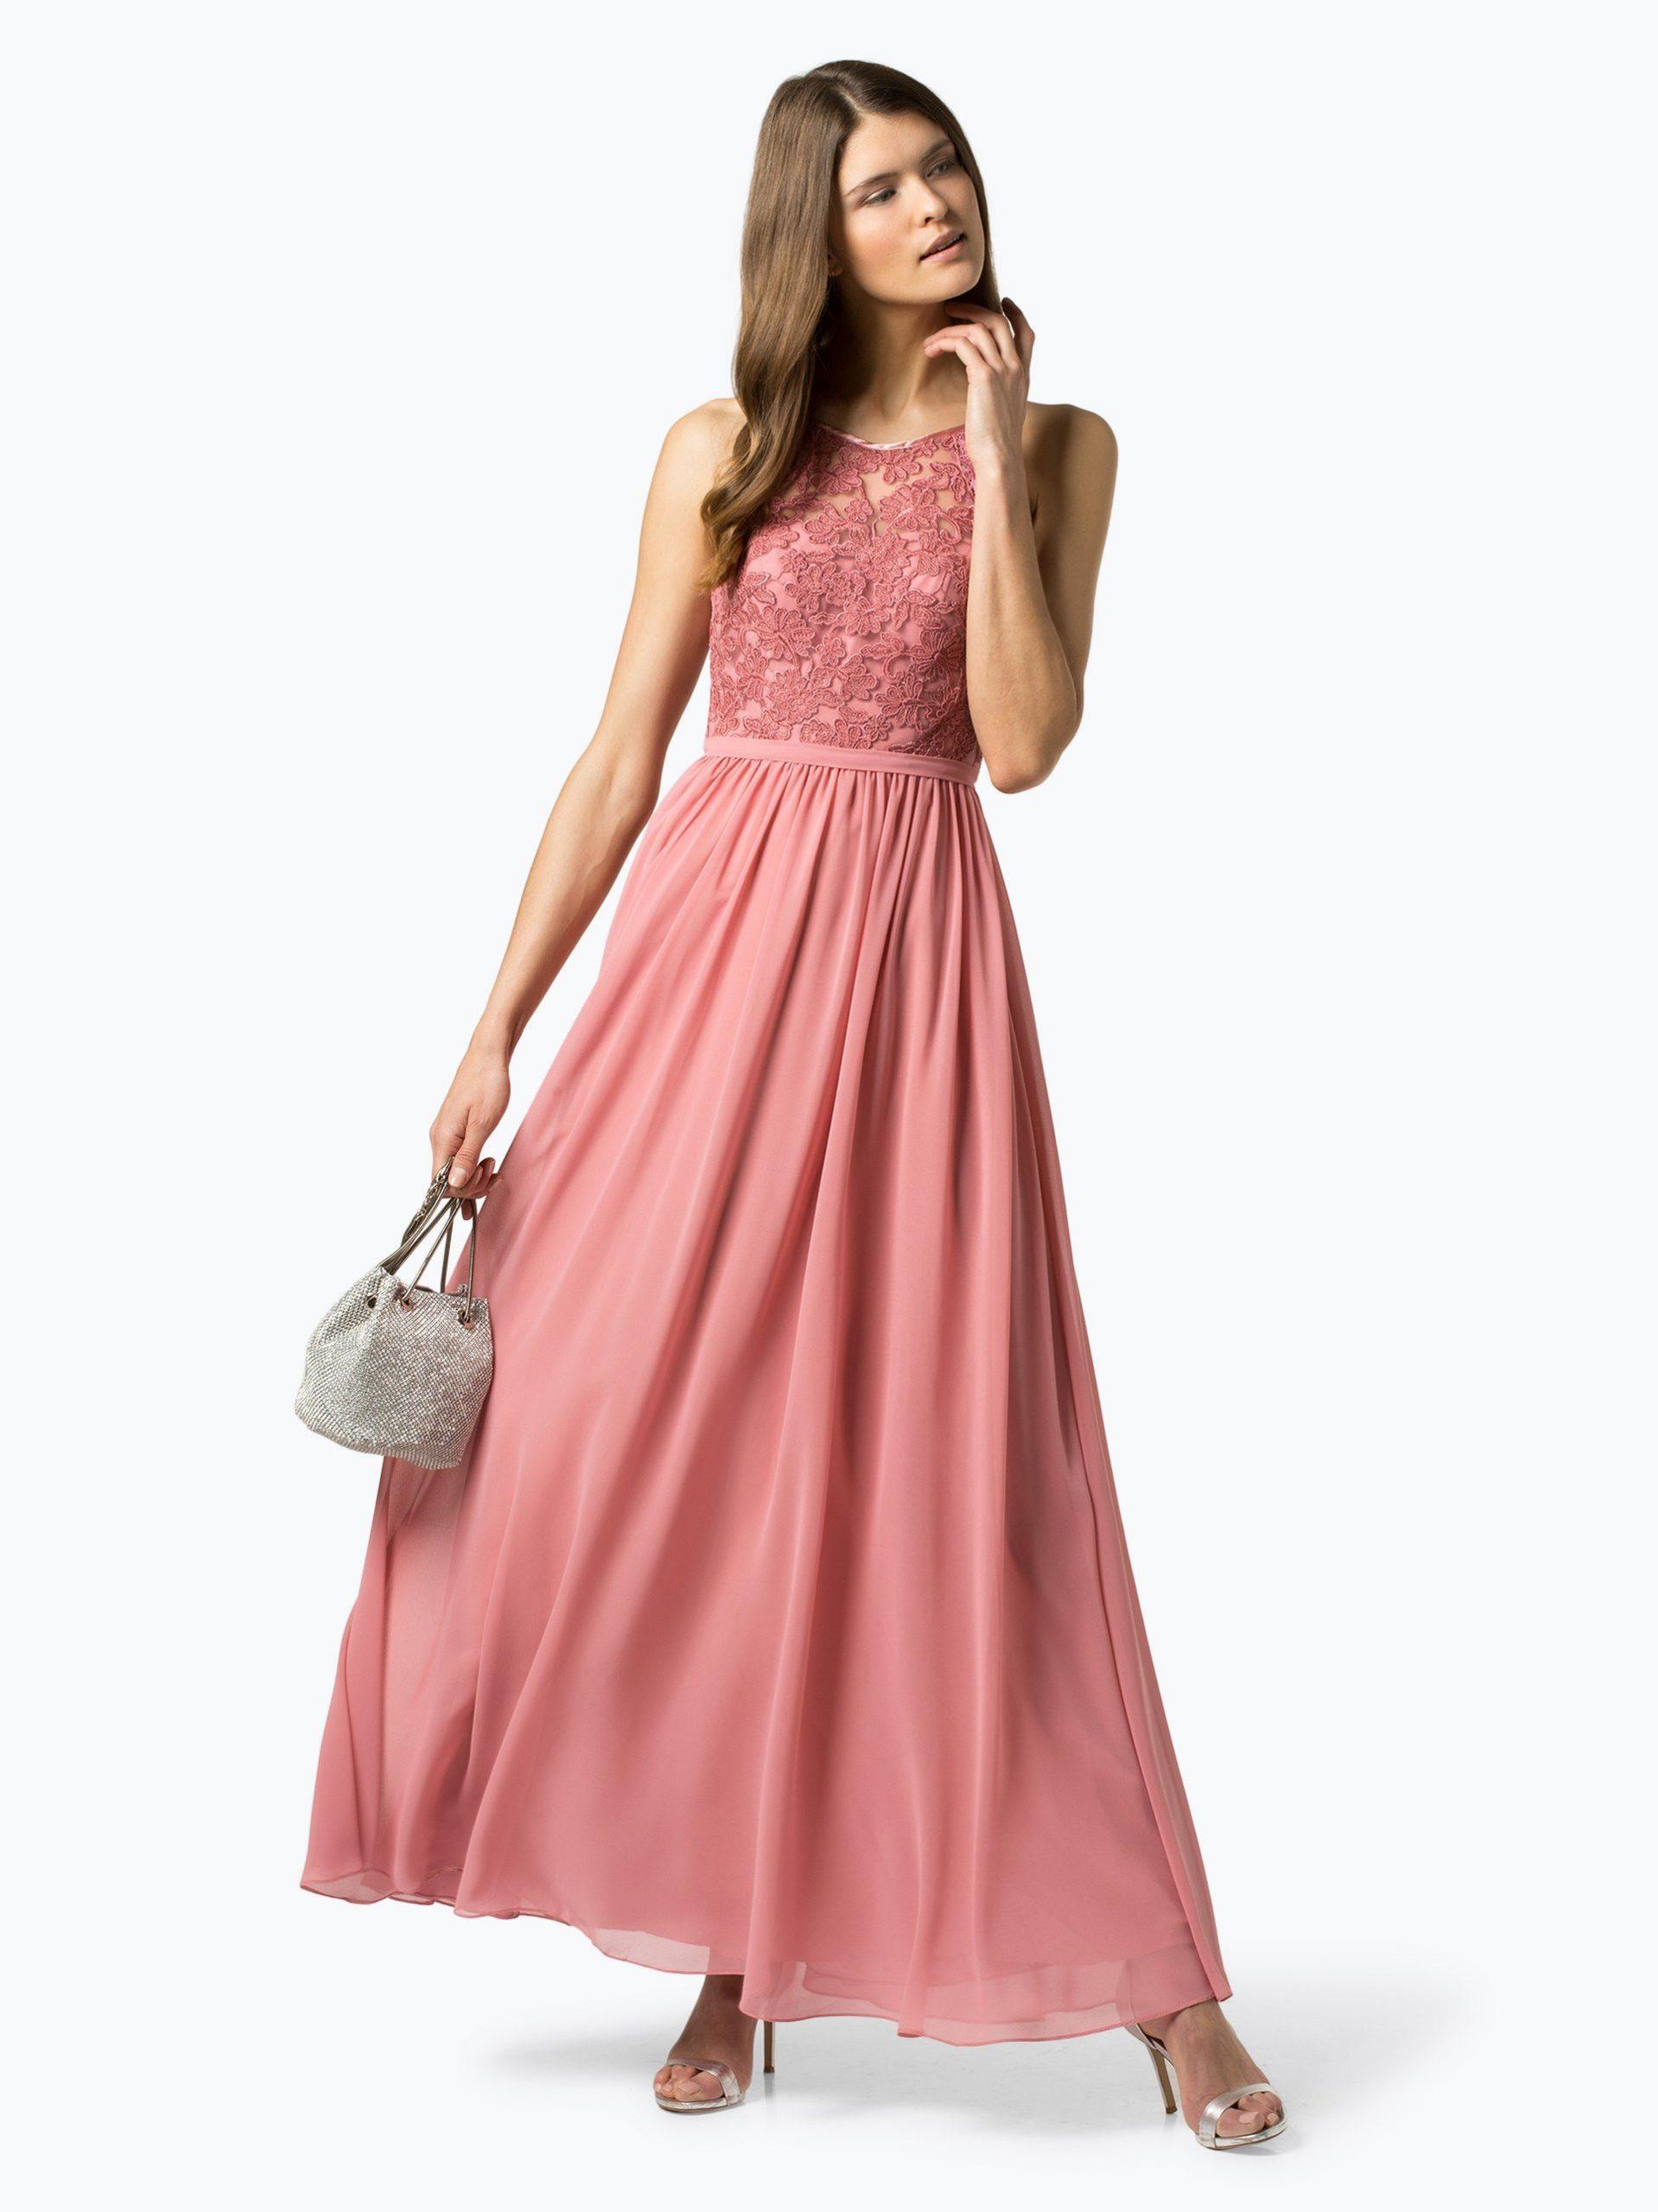 Laona Damen Abendkleid Online Kaufen  Peekundcloppenburgde